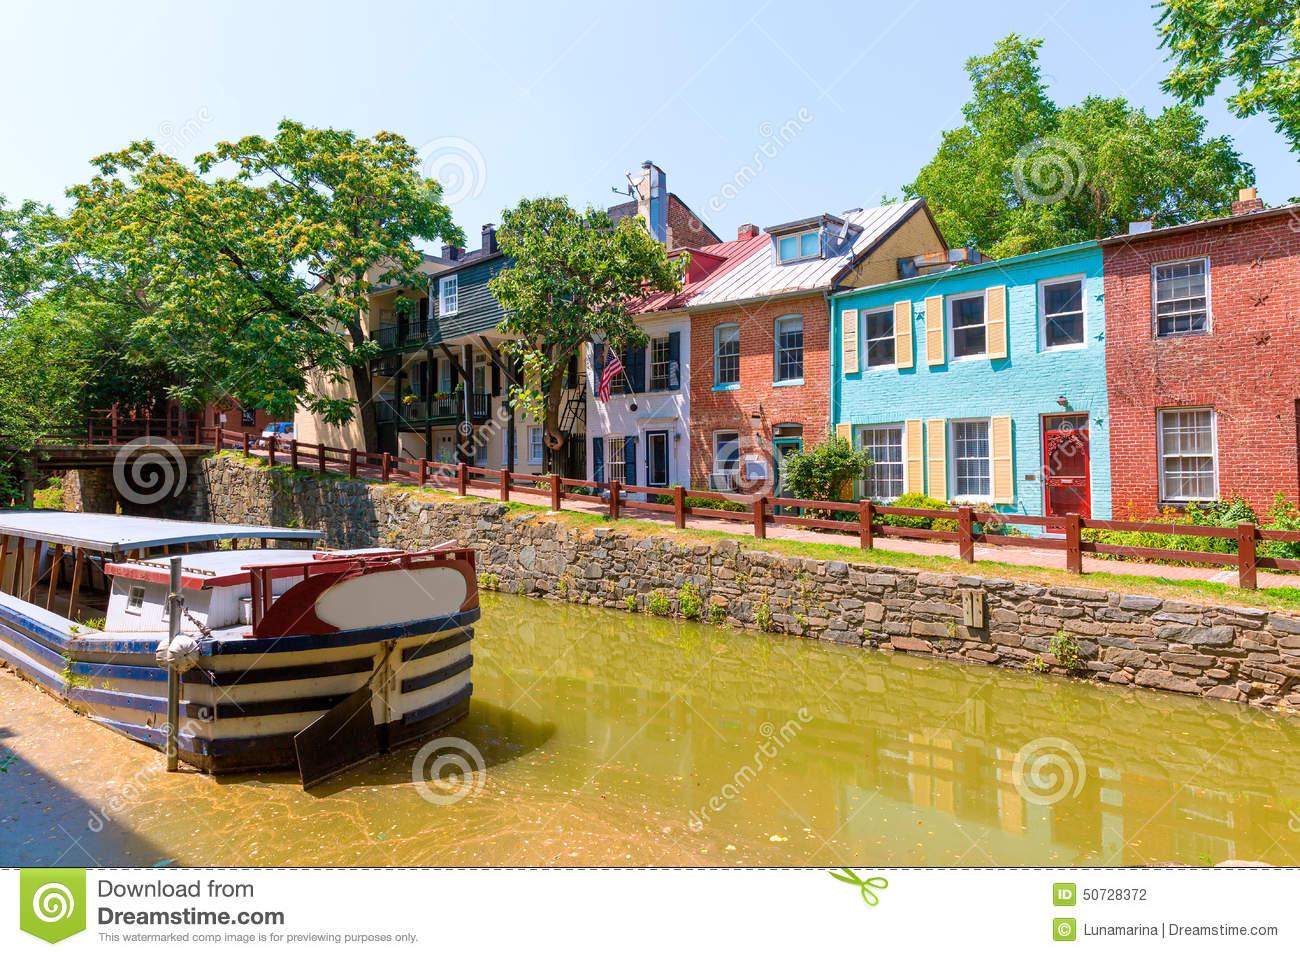 Chesapeake And Ohio Canal Lock In Washington DC Royalty Free Stock.